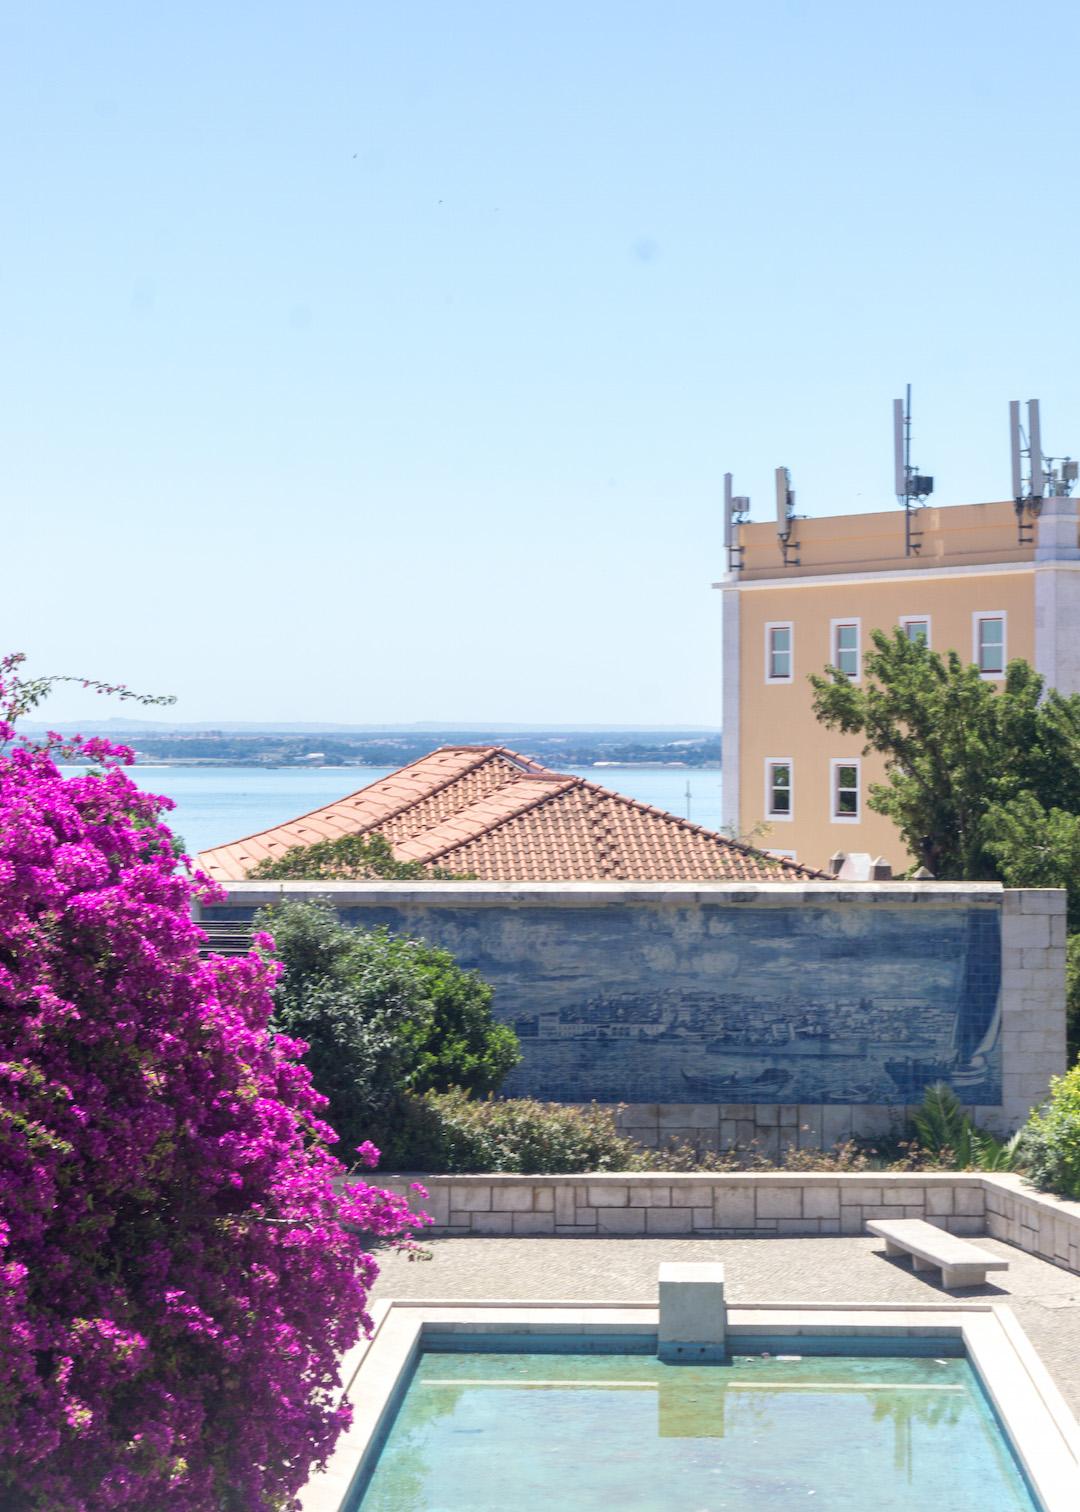 Her_Travel_Edit_Lisbon_Miradouro_de_Santa_Luiza_Bougainvillae